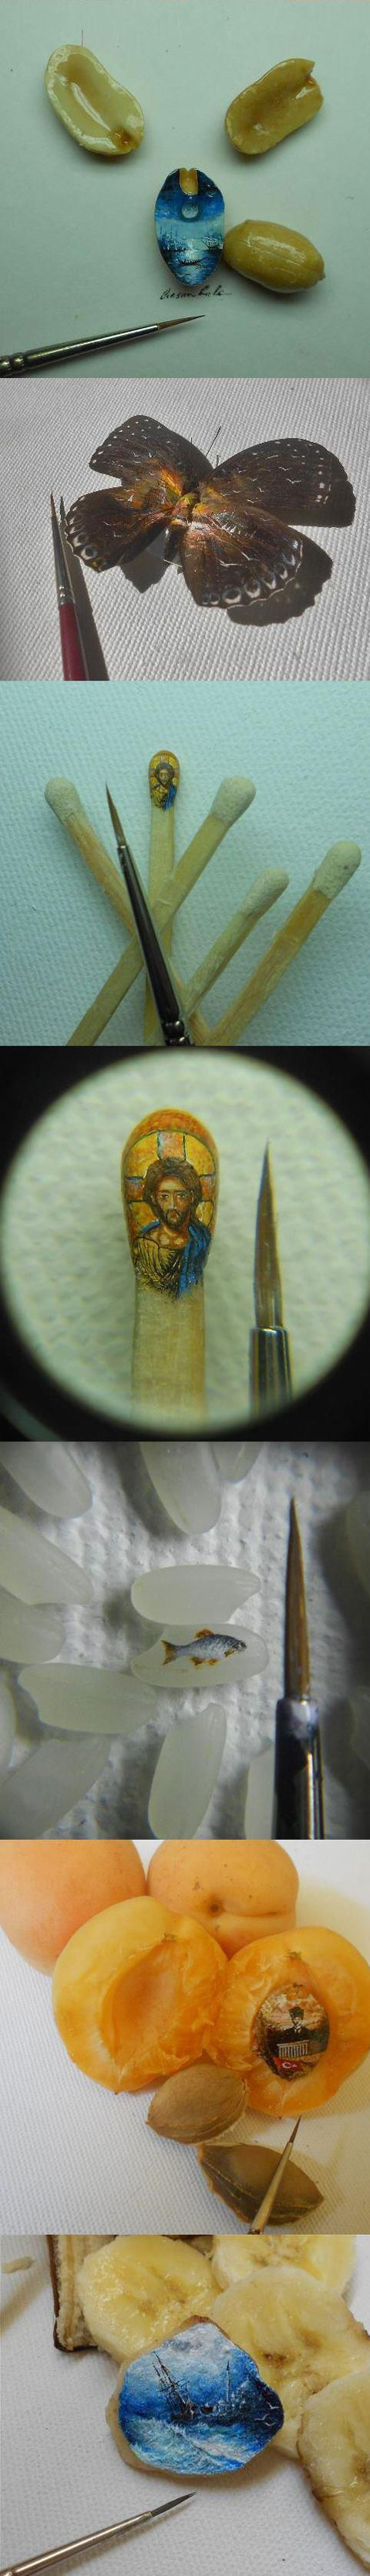 cool-artist-miniature-art-brush